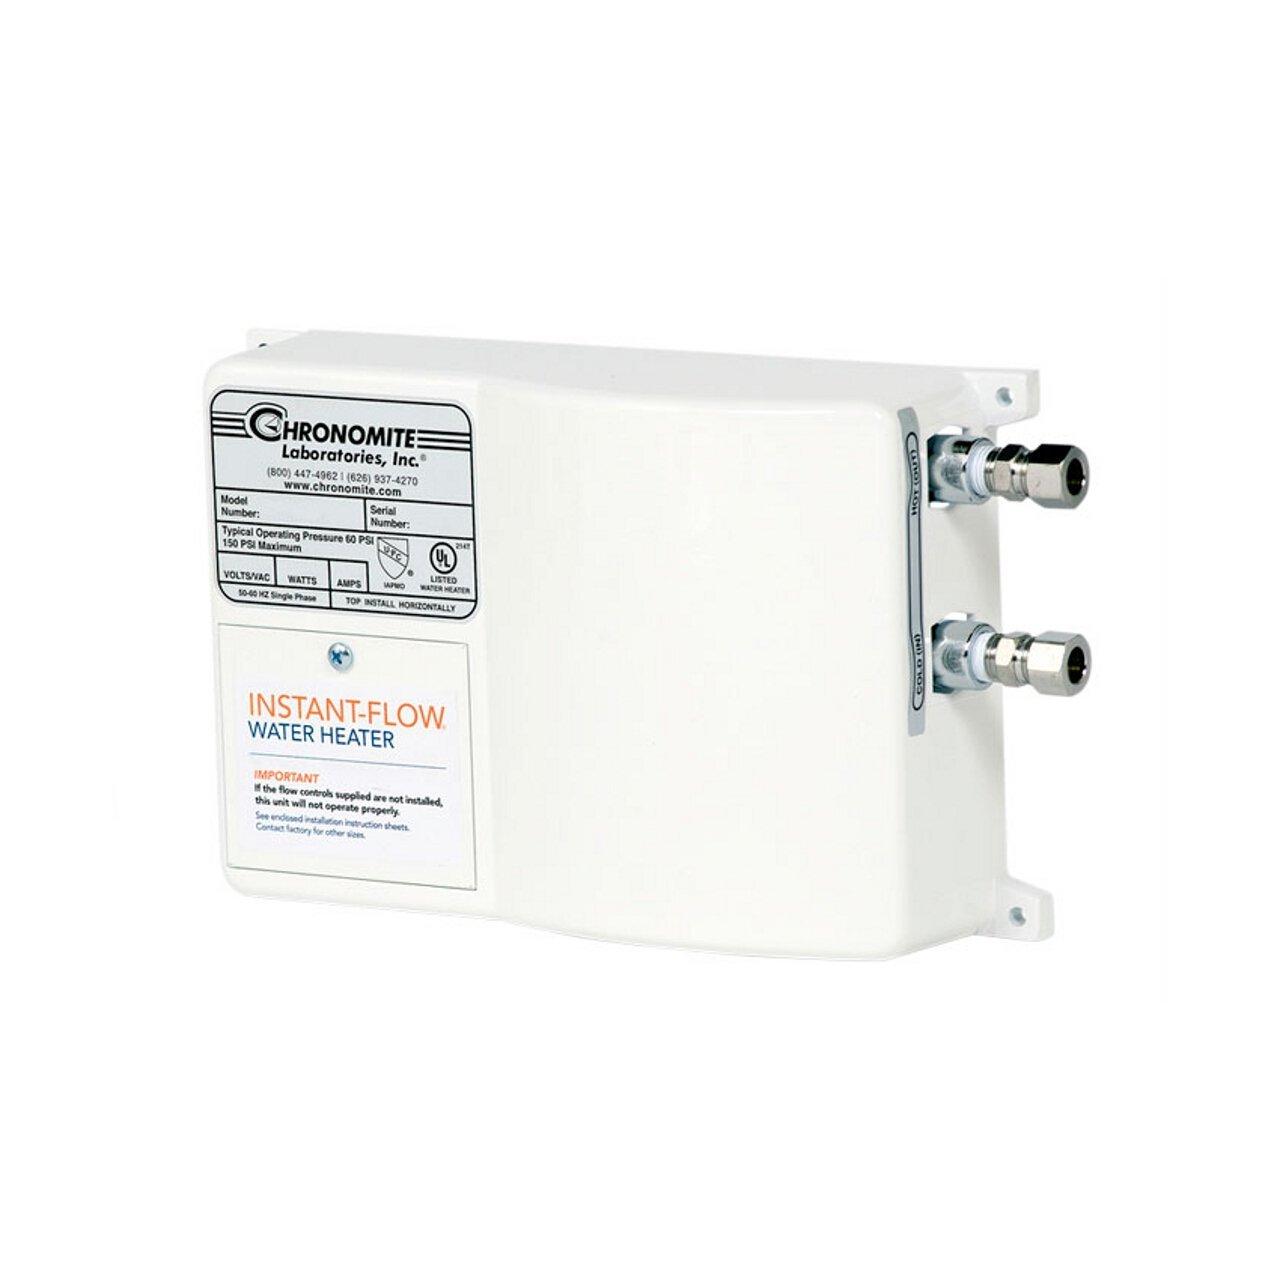 Chronomite SR-20L HTR 240-Volt Low Flow Tankless Water Heater